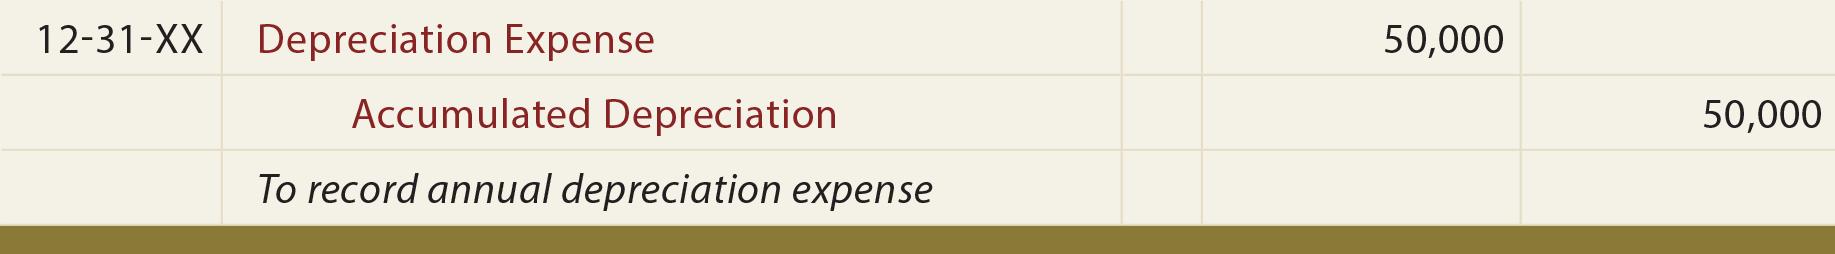 Depreciation journal entry